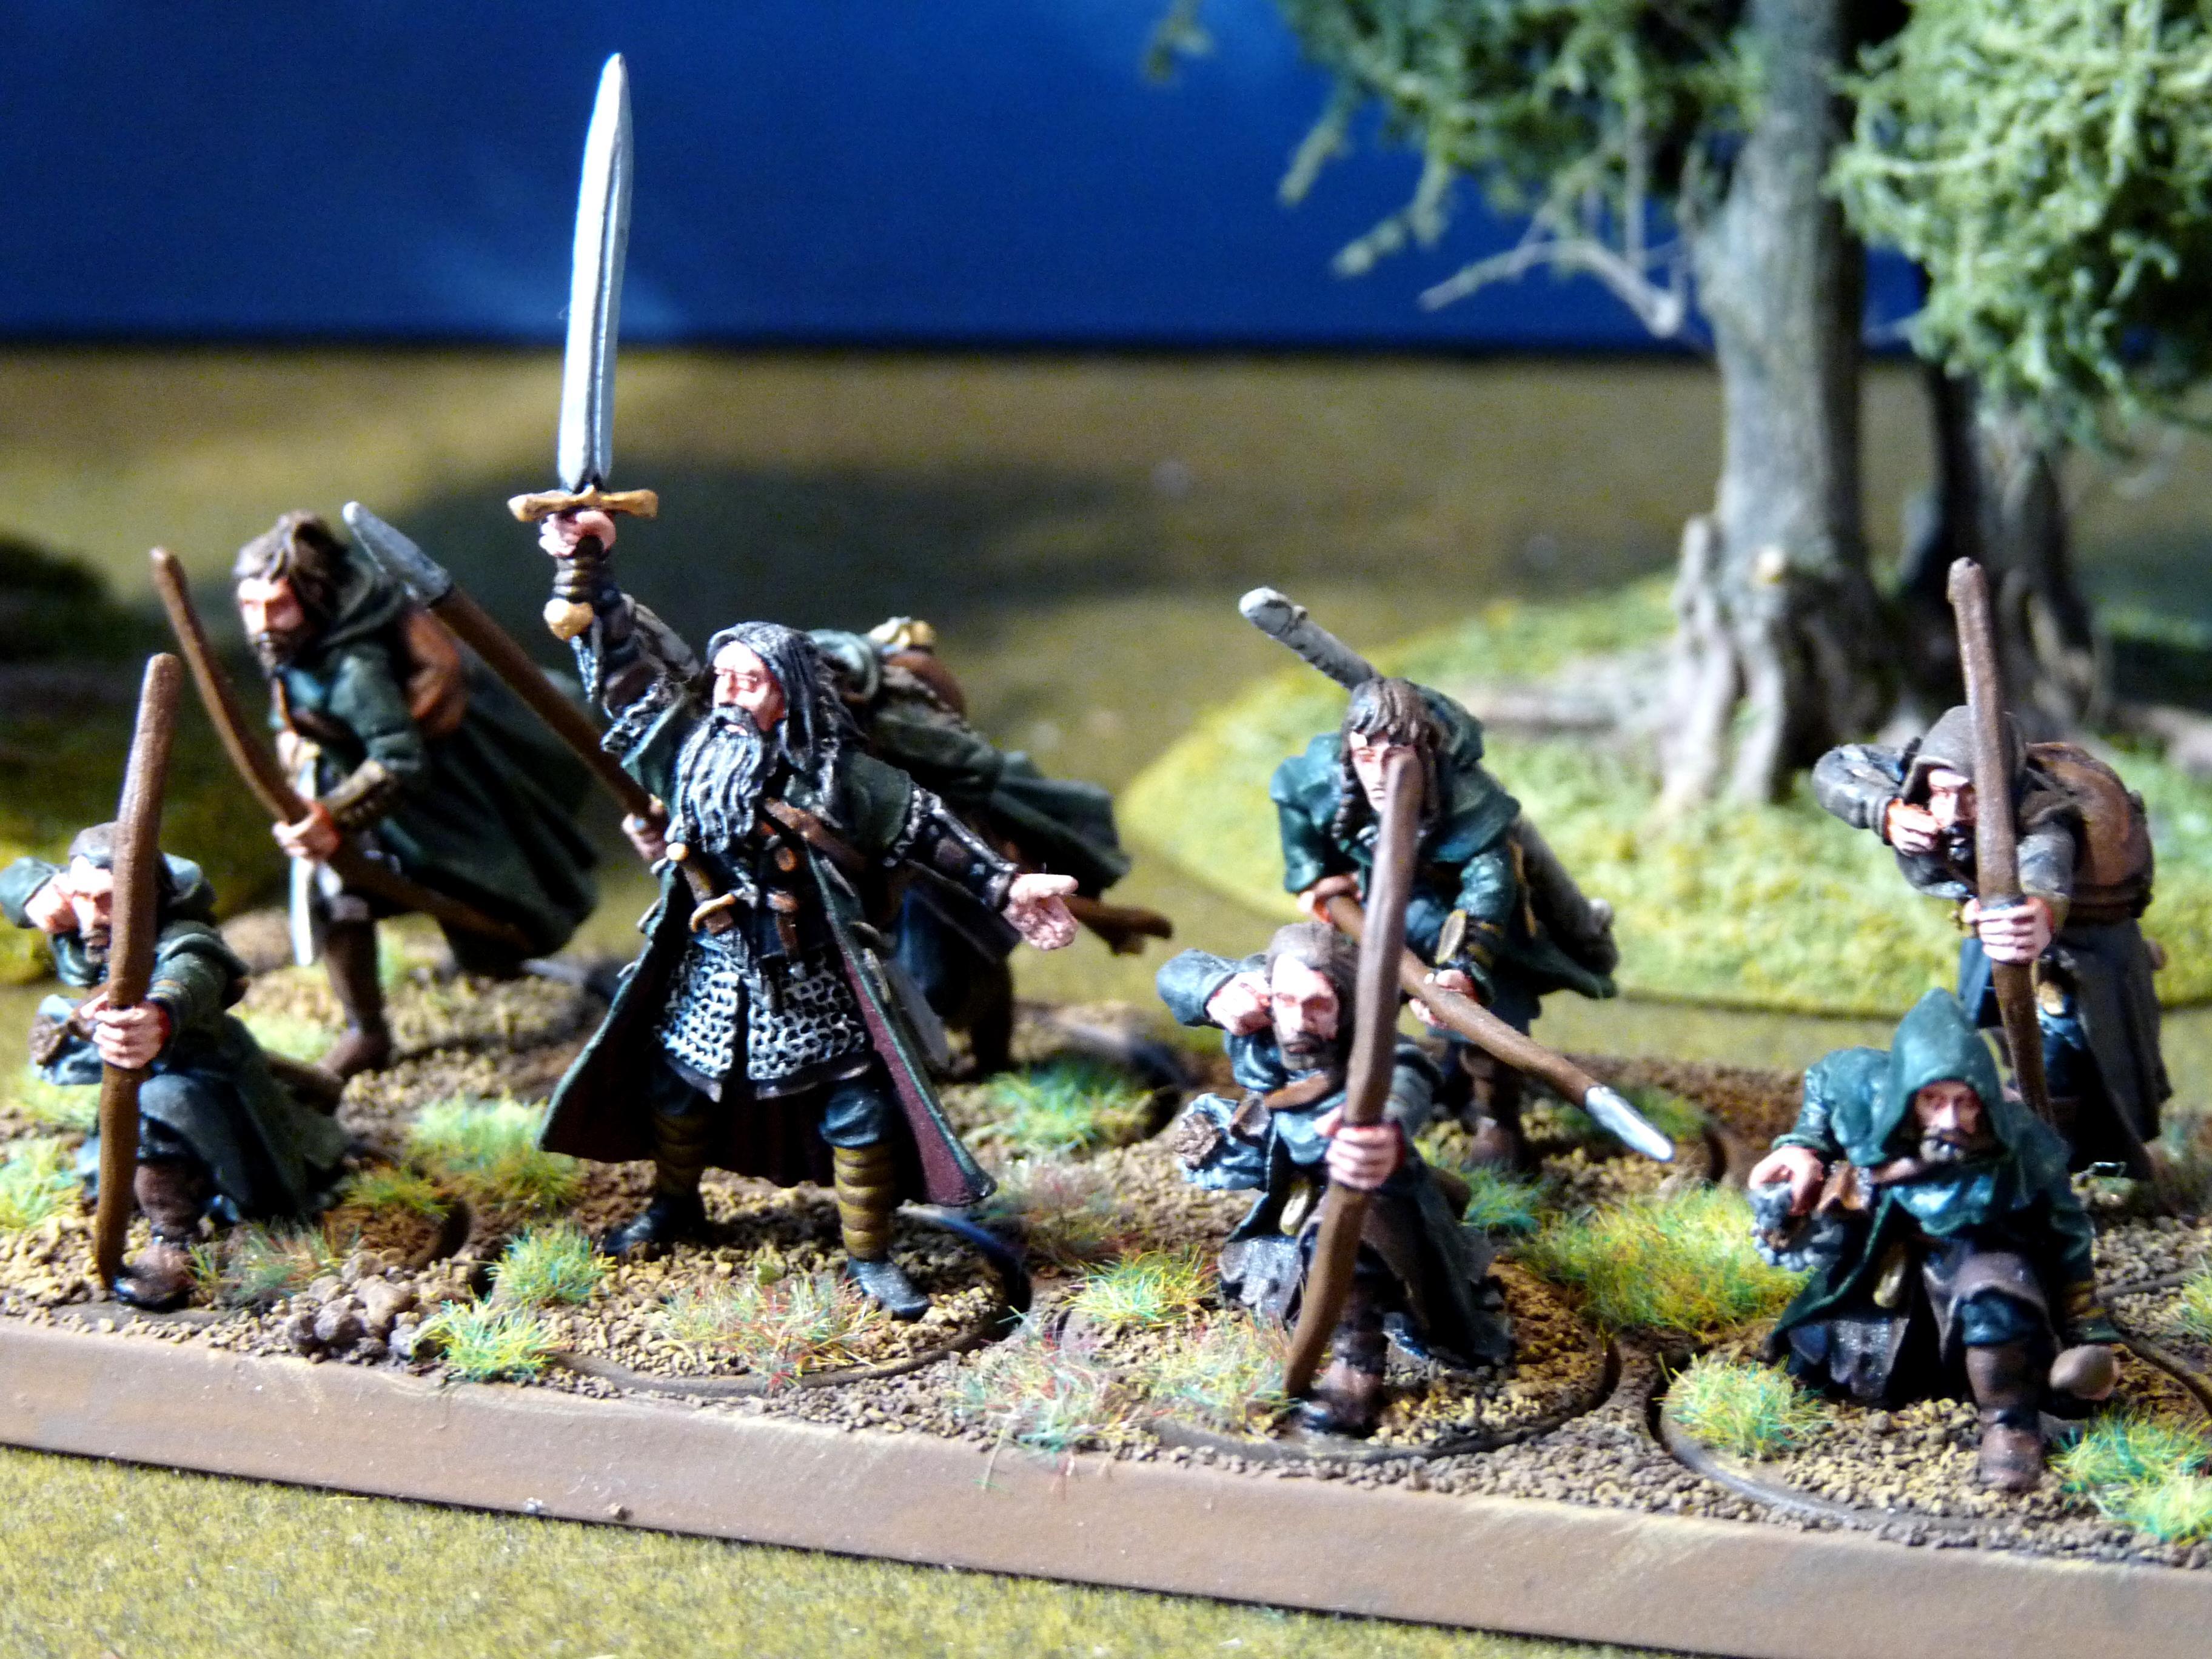 Dunedain, Lord Of The Rings, Minas Tirith, Rangers